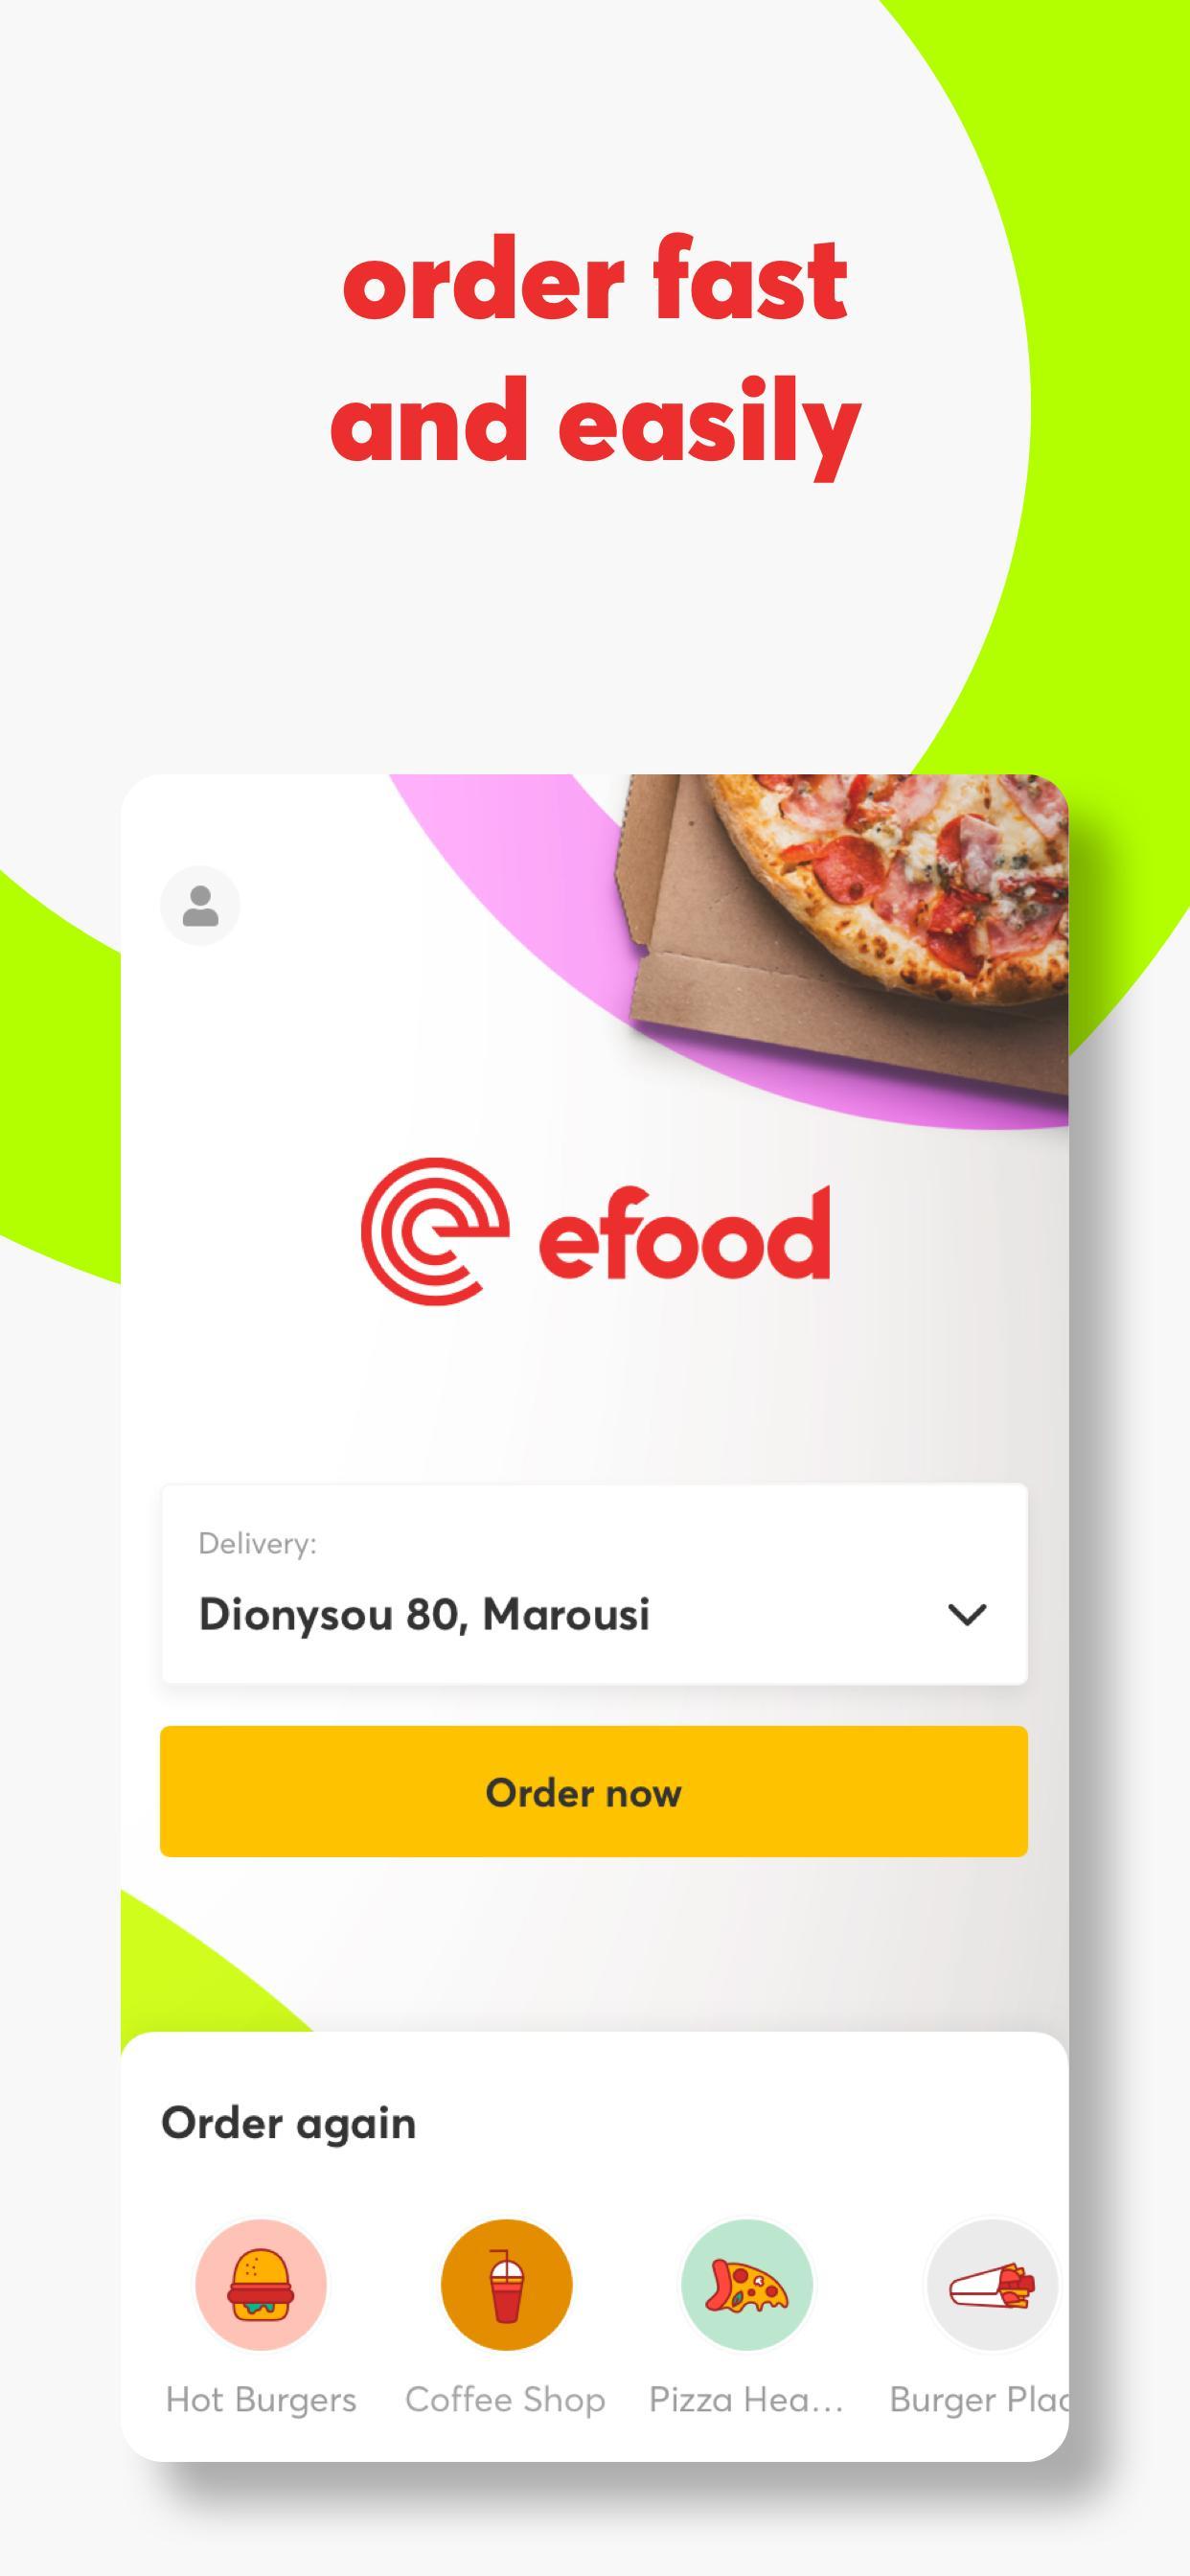 efood delivery 4.6.1 Screenshot 1